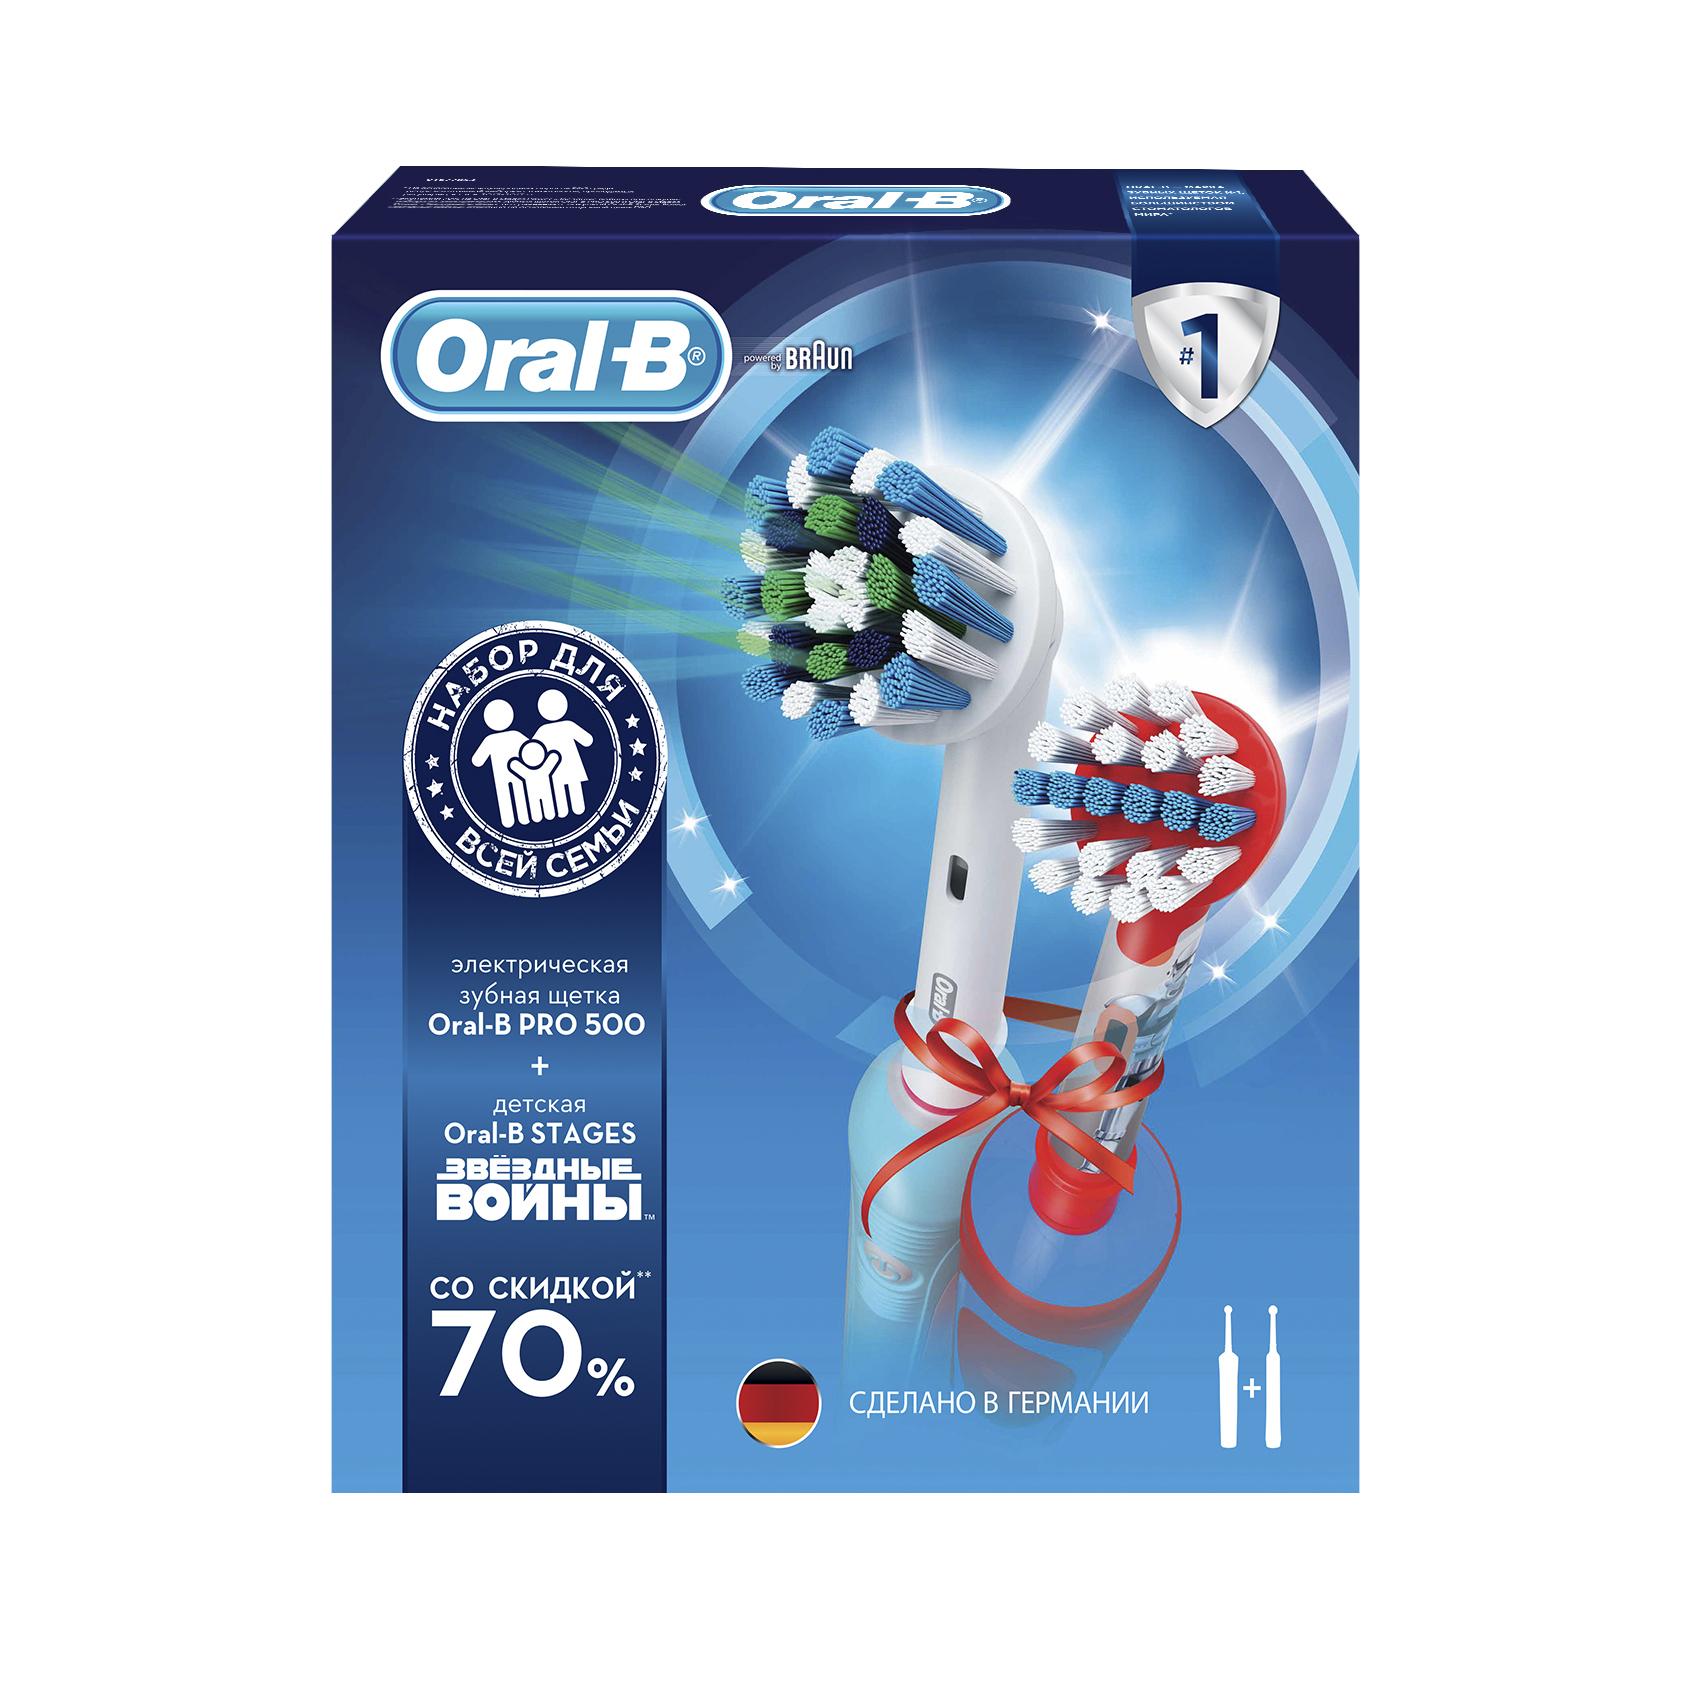 Набор электрических зубных щеток Oral-B PRO 500 и Oral-B Stages Power \'Звездные войны\'.